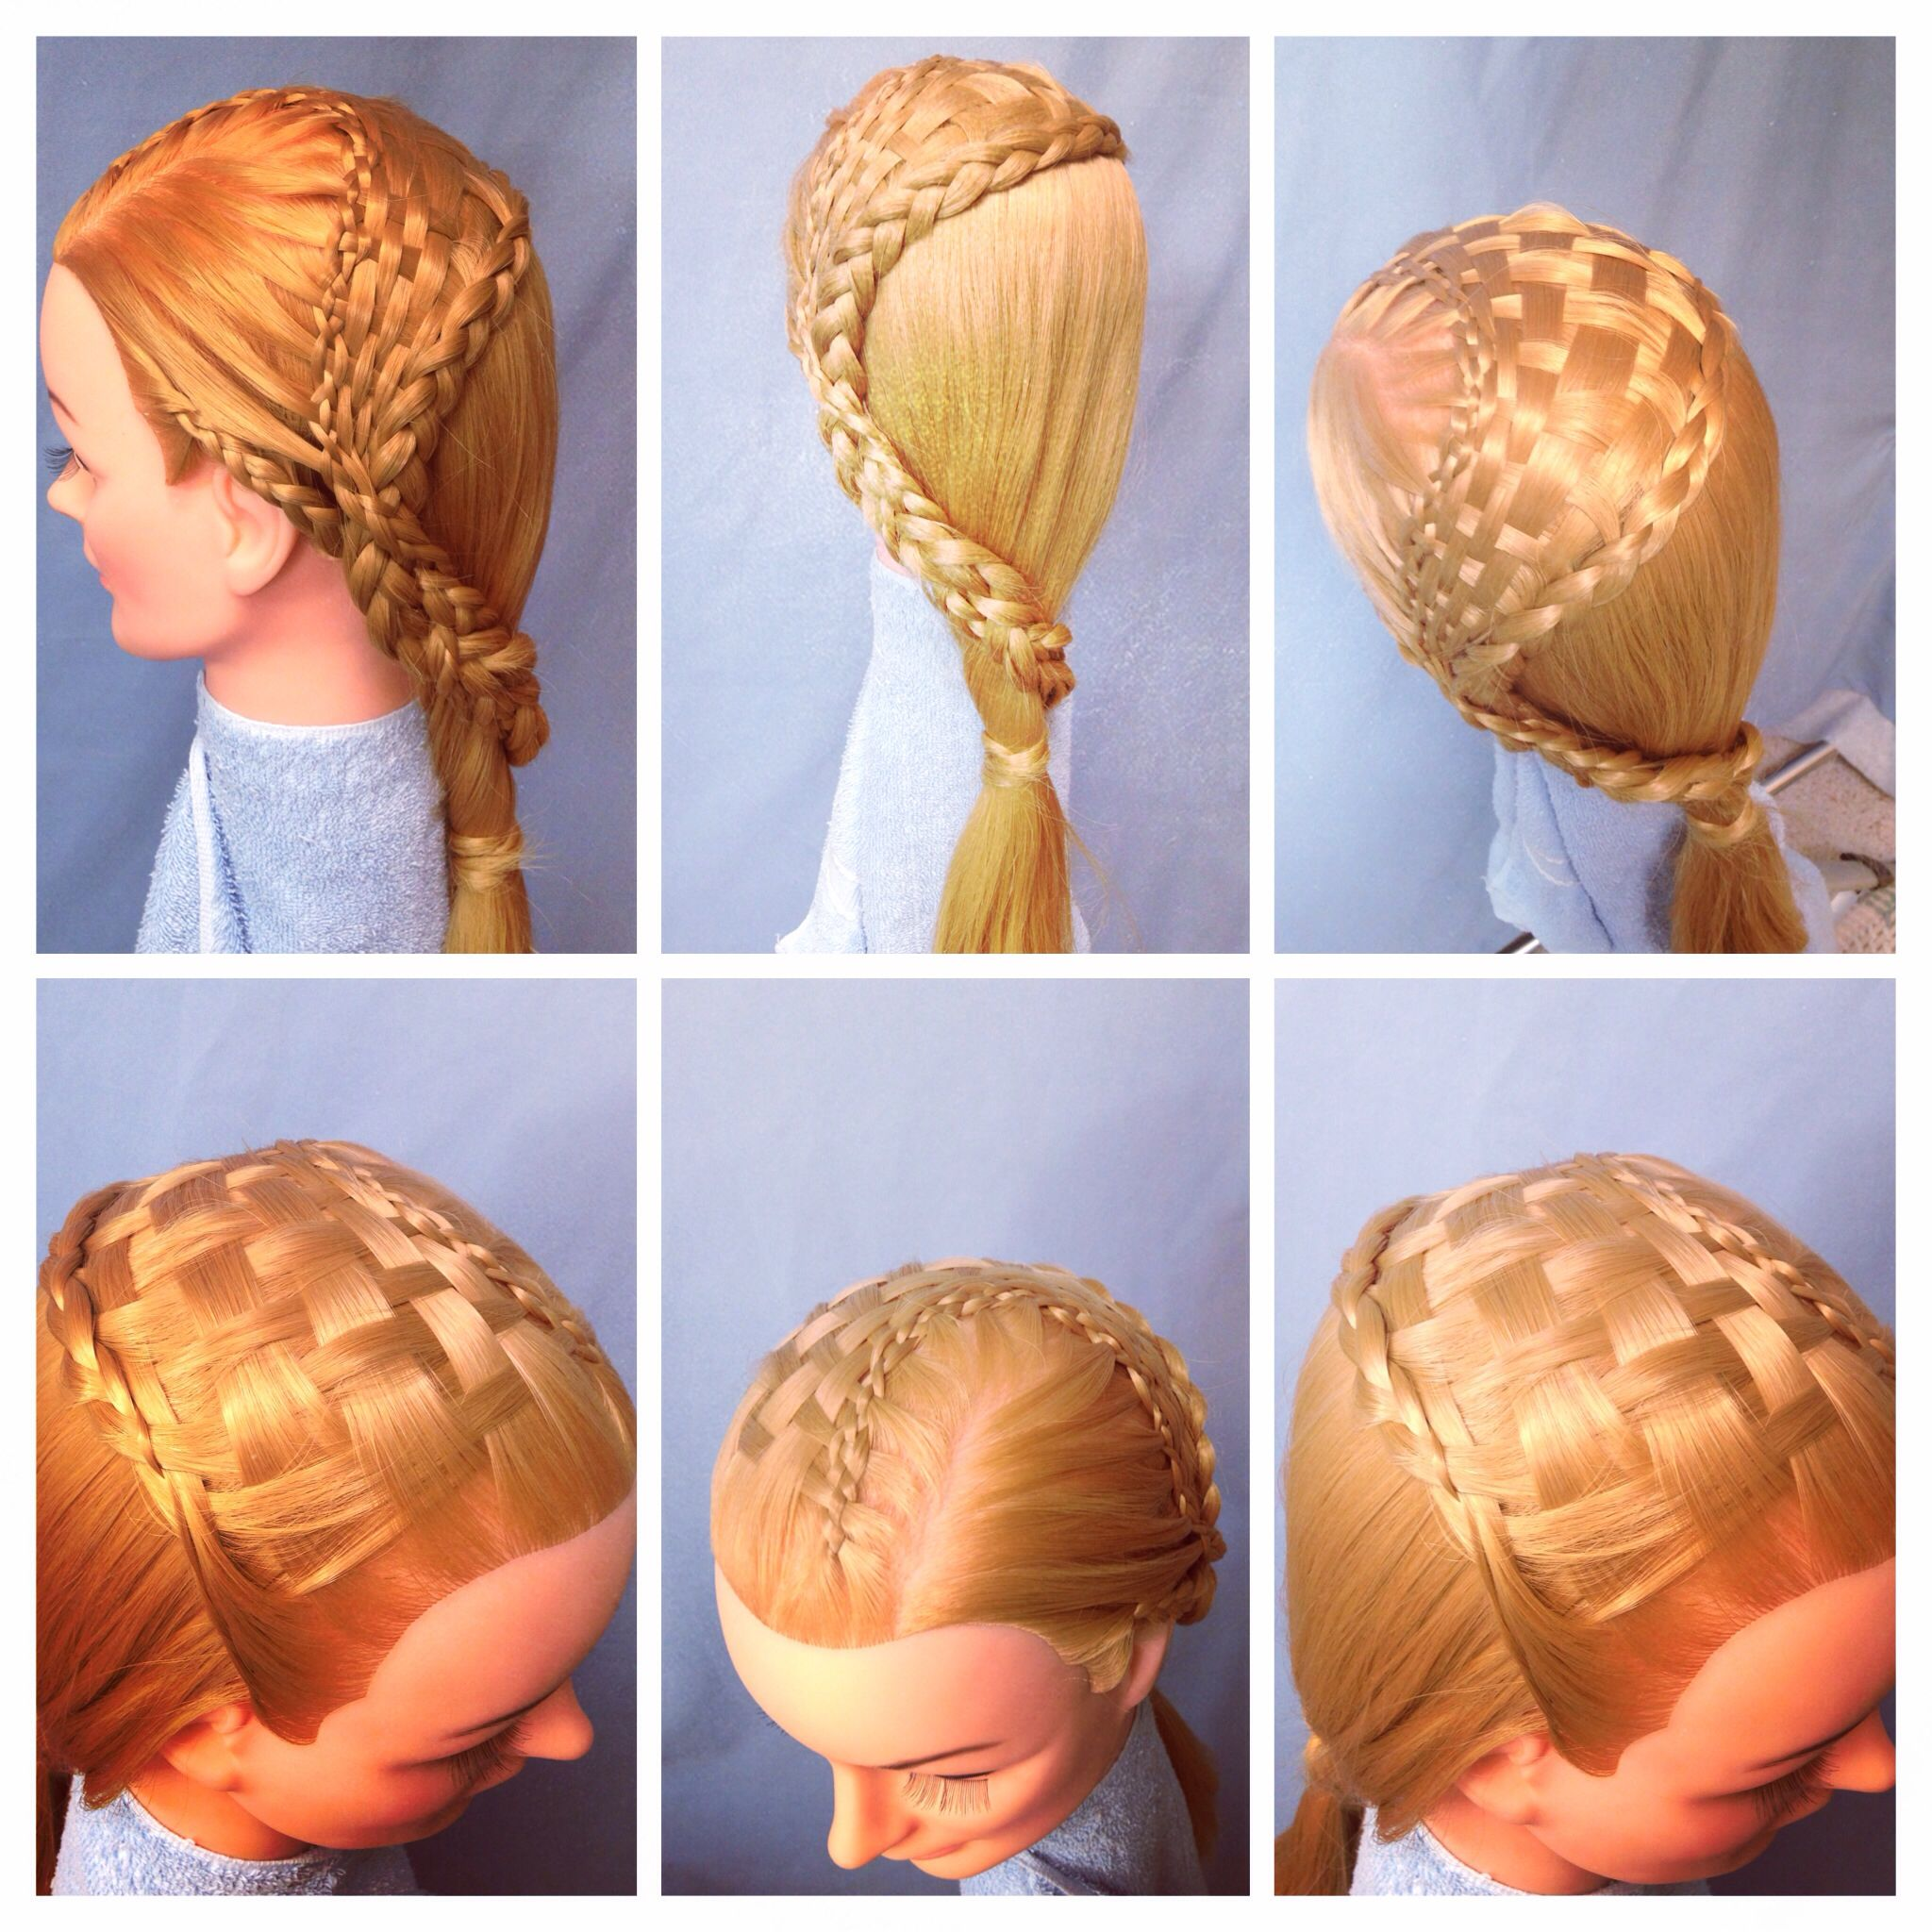 Yellow brick road #braid #basketweave #hair #braids